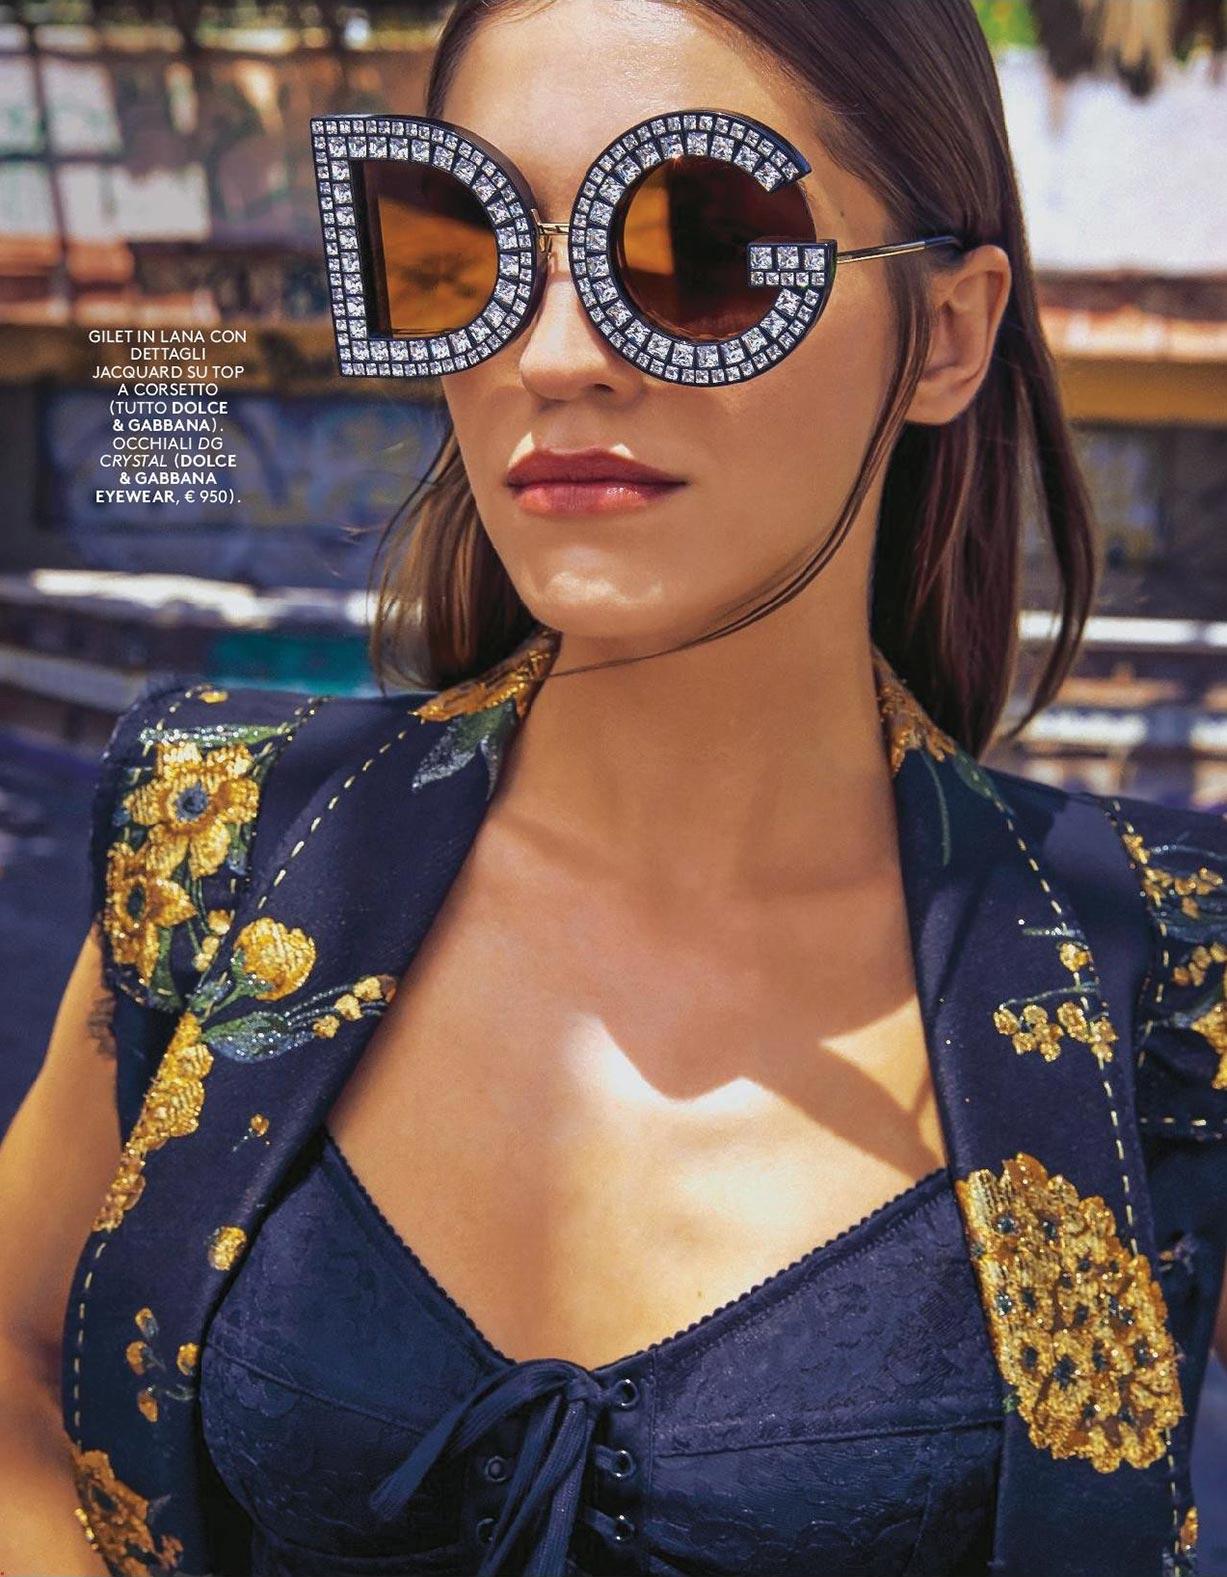 Модные солнцезащитные очки / Sguardi di Sole / Samantha Gradoville by Fred Meylan / Grazia Italy june 2018